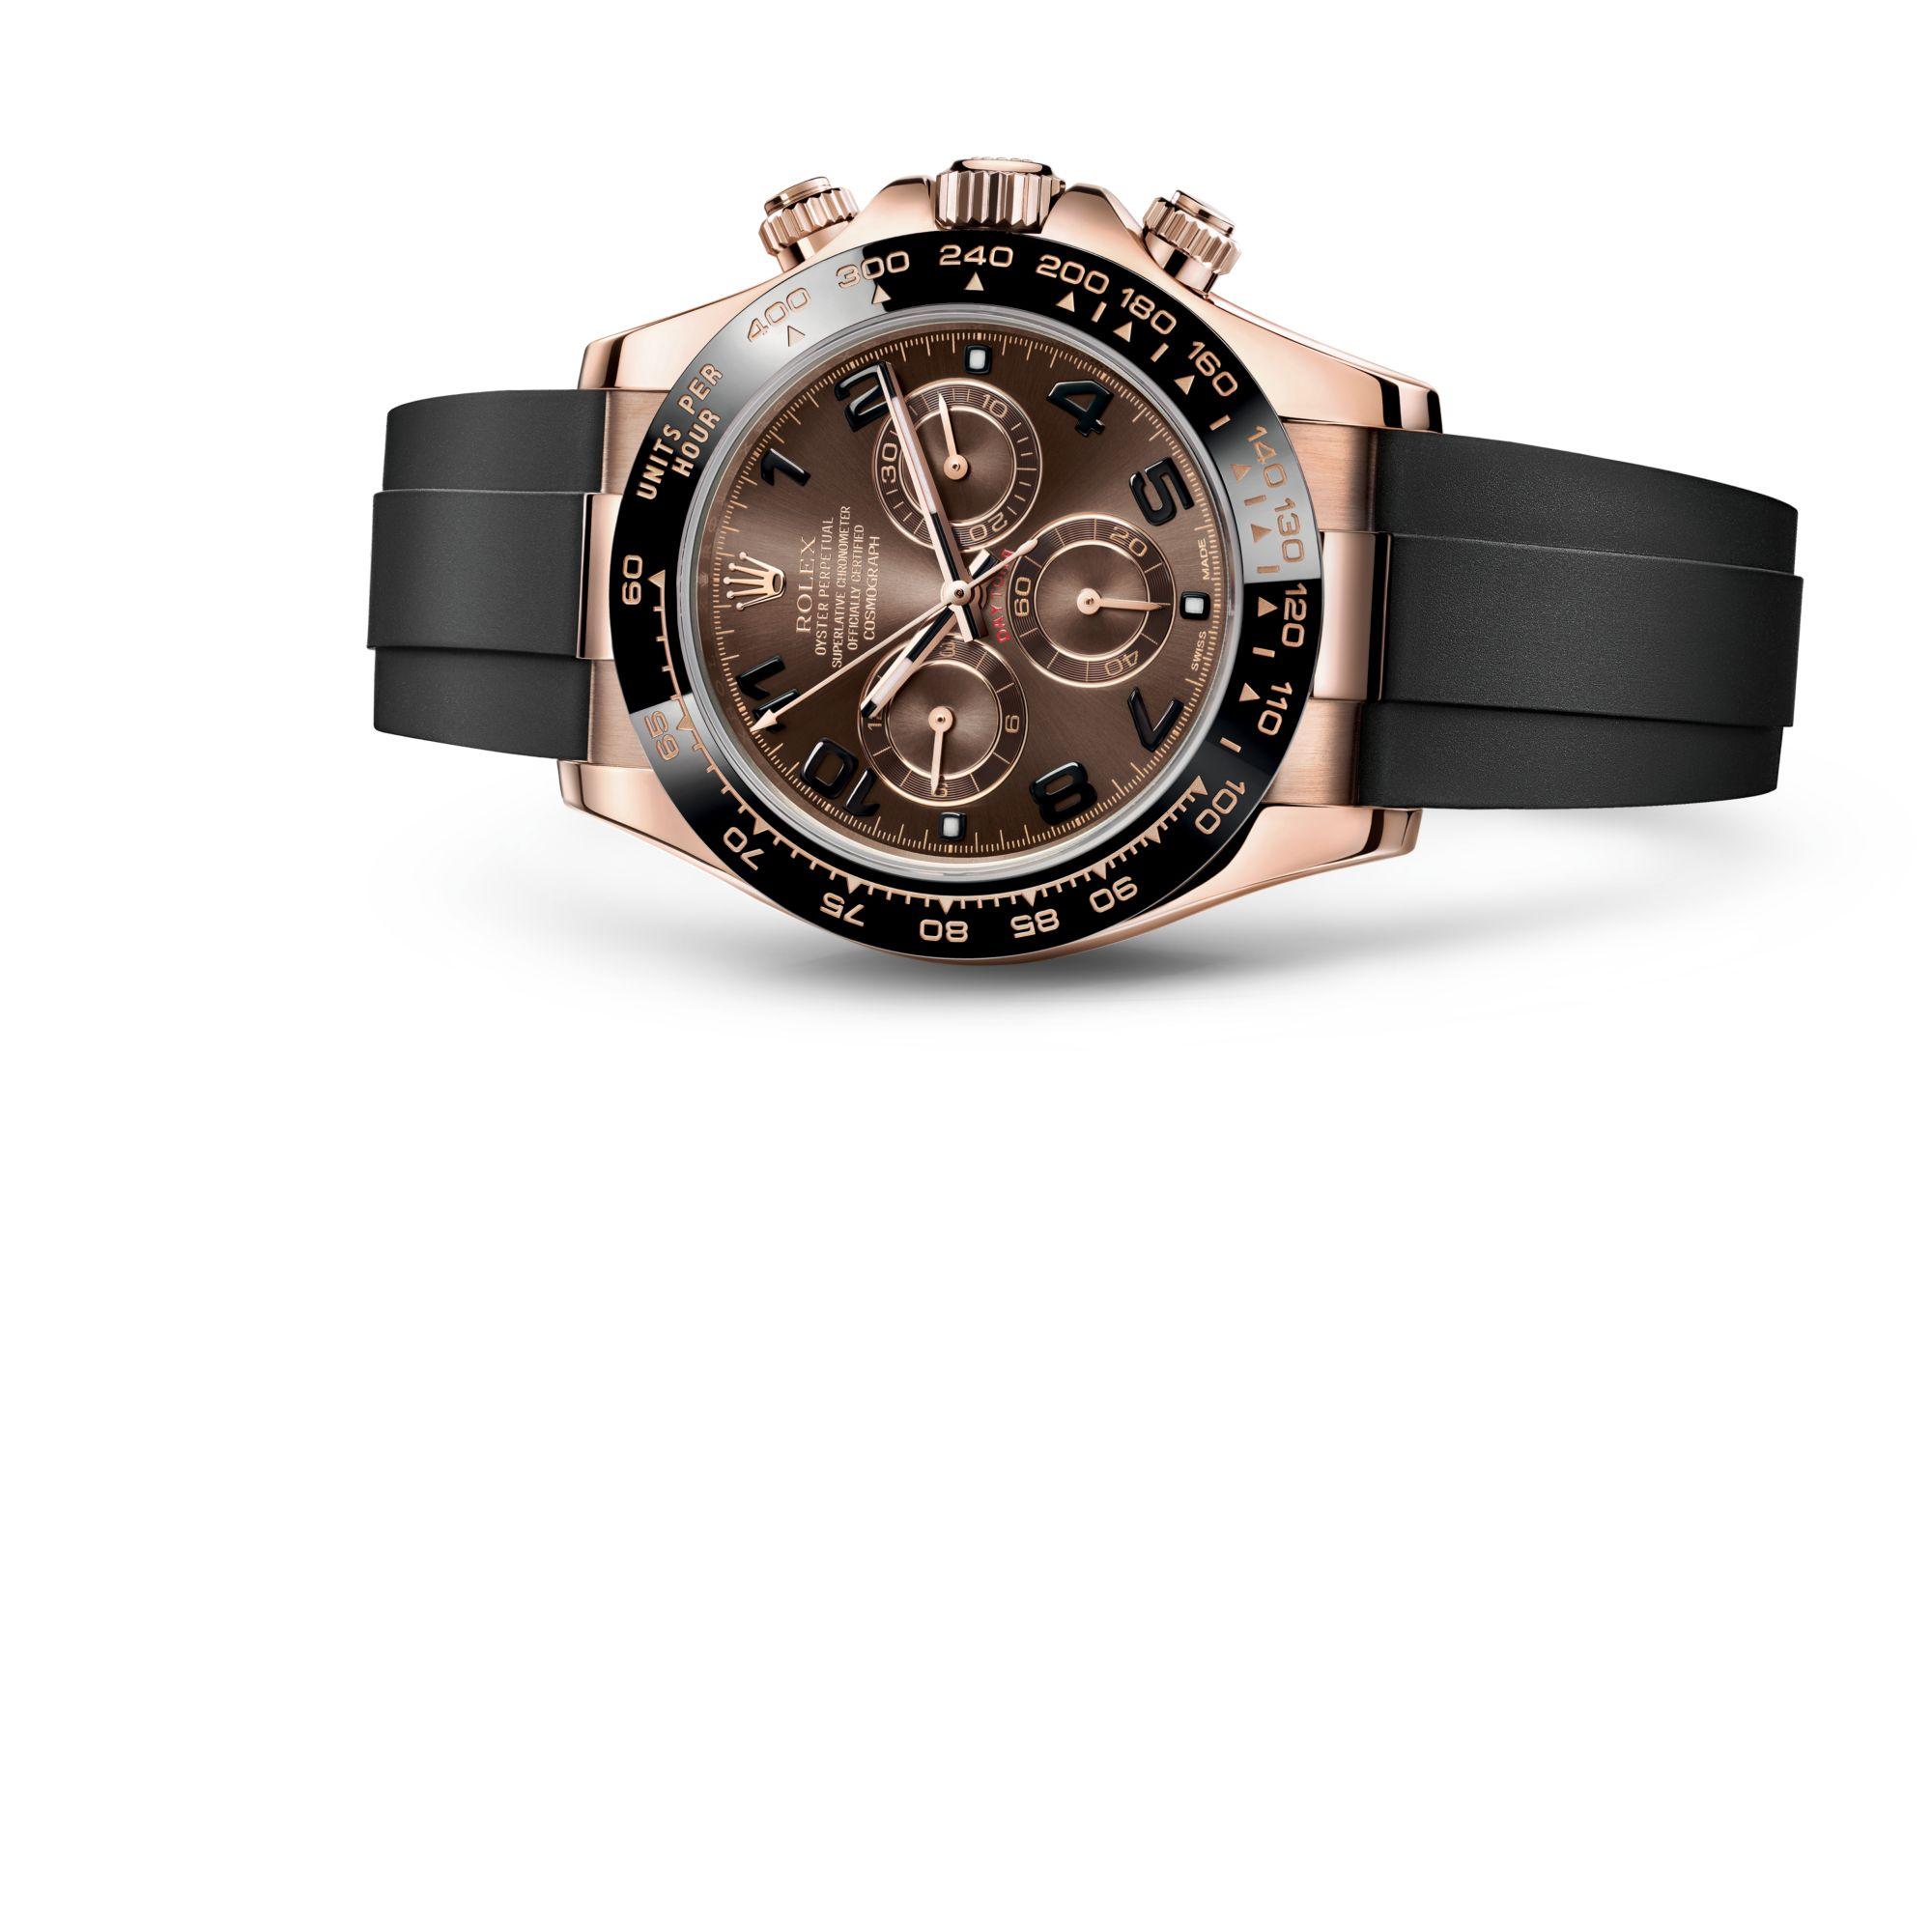 Rolex كوزموغراف دايتونا M116515LN-0015